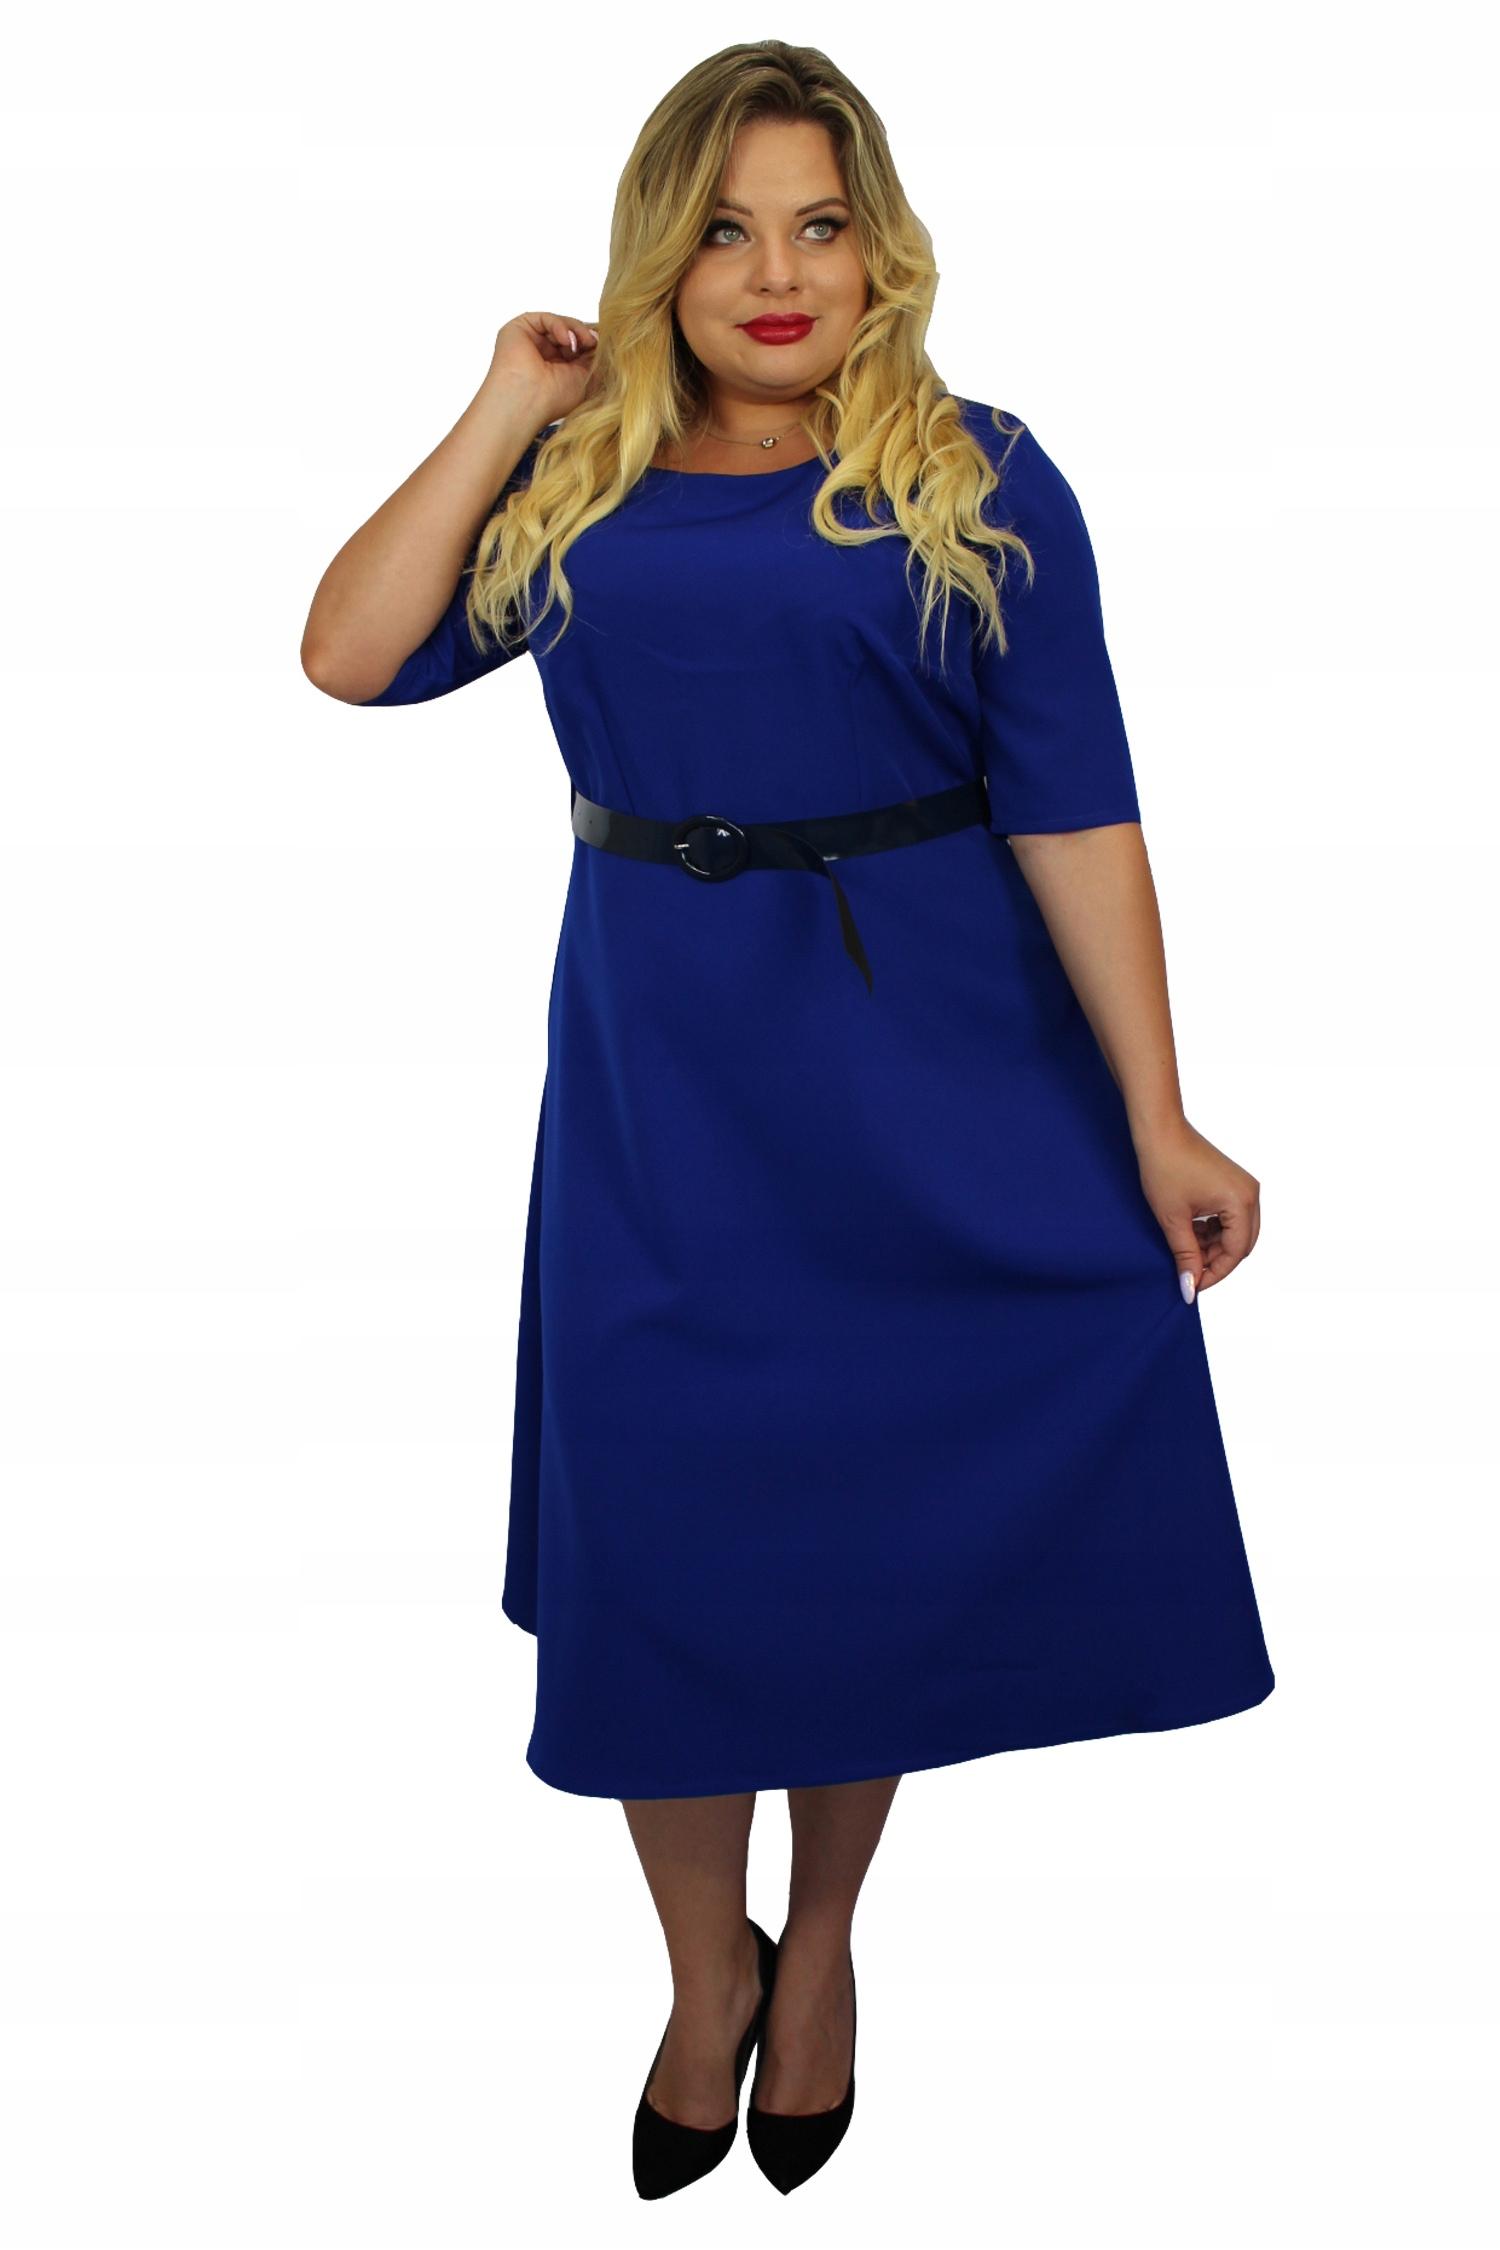 d203d02e Sukienka ADEL rozkloszowana pasek chaber 42 - 7547378135 - oficjalne ...